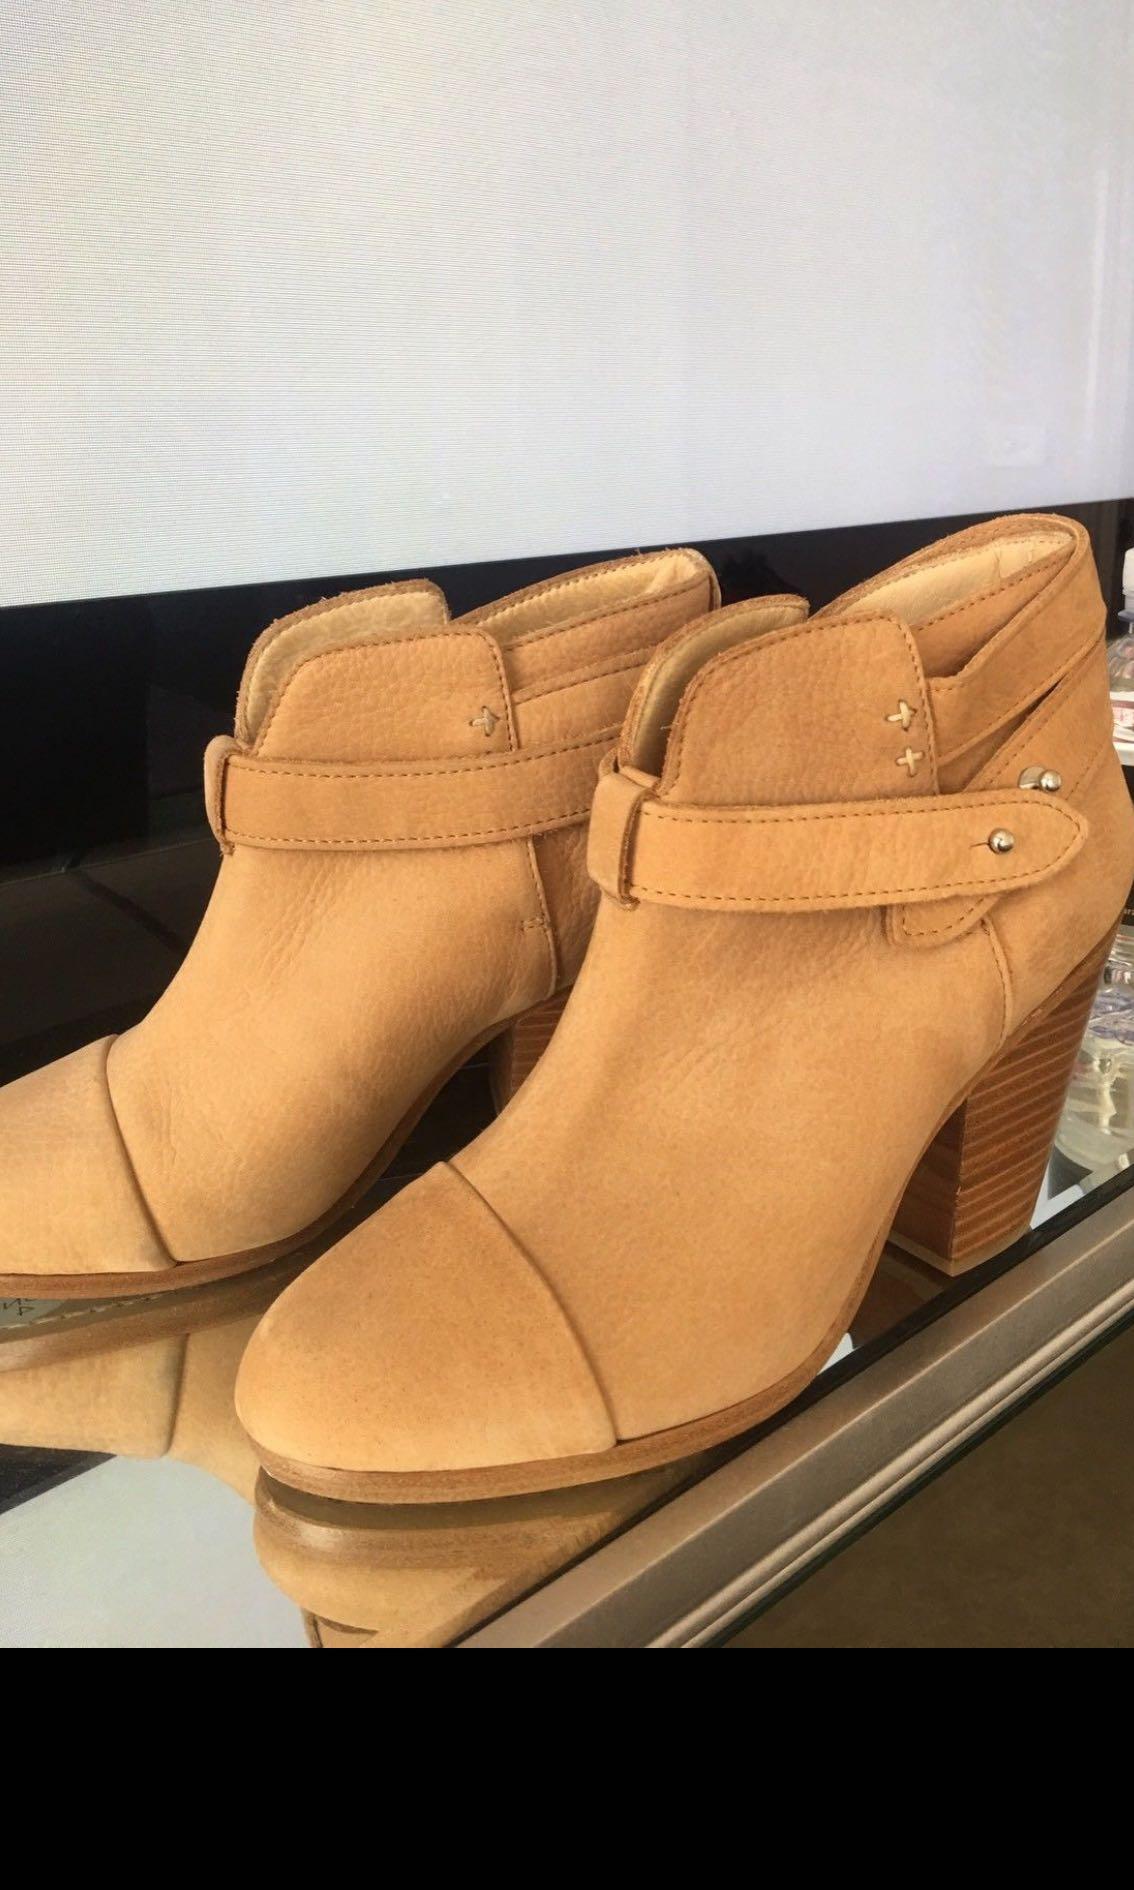 Rag and Bone Harrow Boots Brown size 36 BRAND NEW